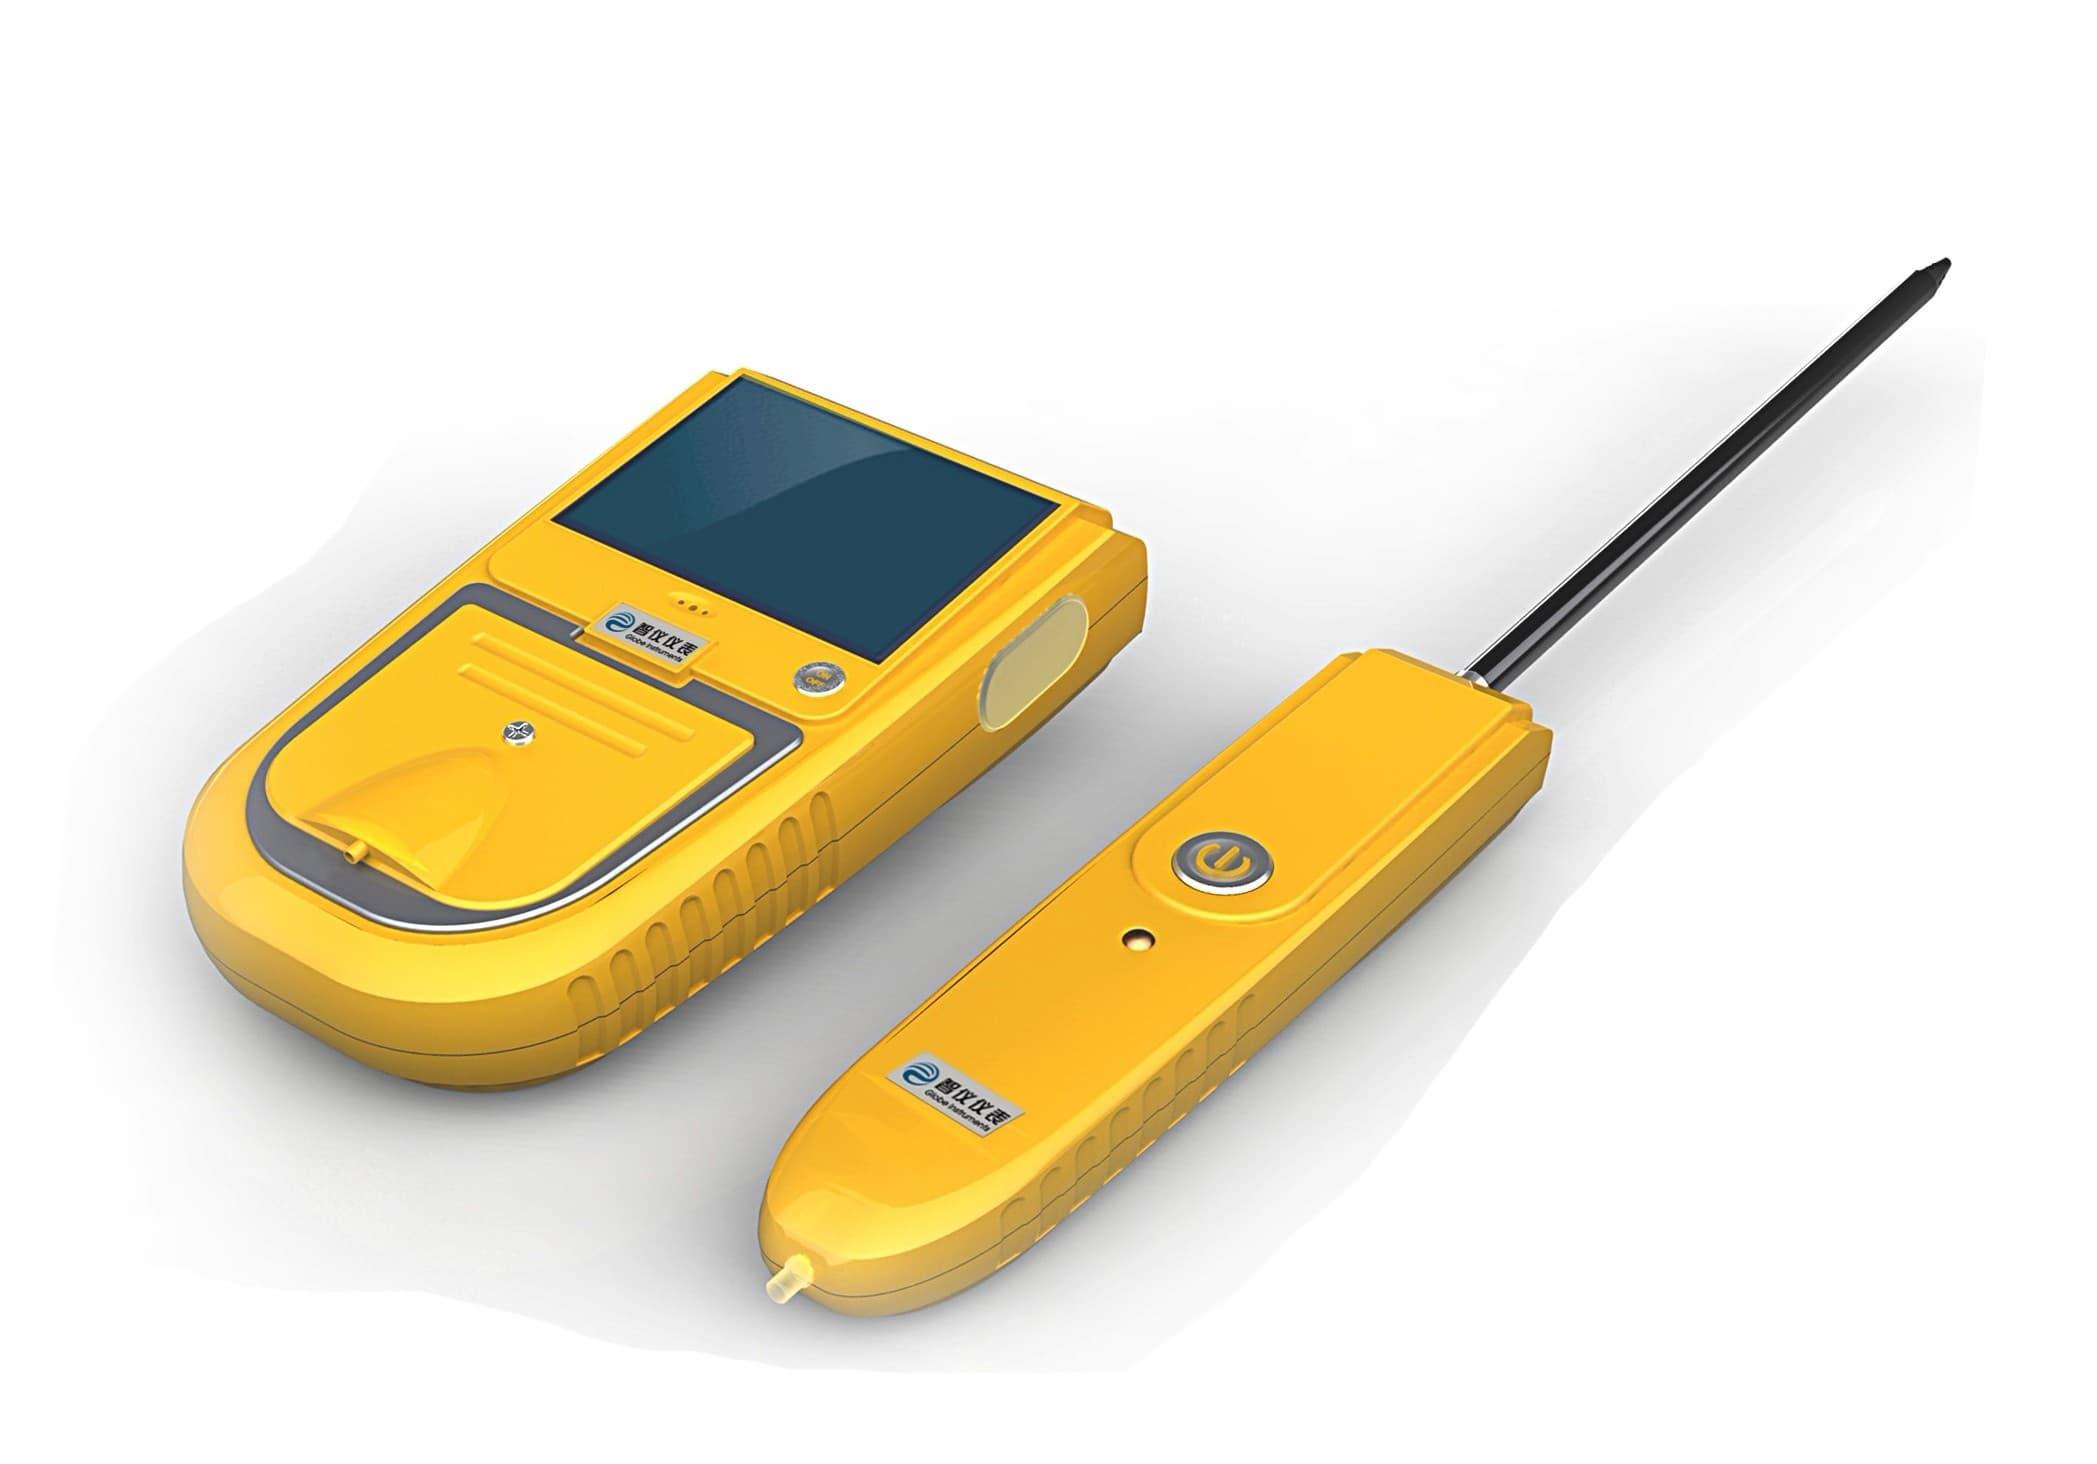 Portable Gas Detection Systems : Pgas portable multiple gas detector ch o co h s